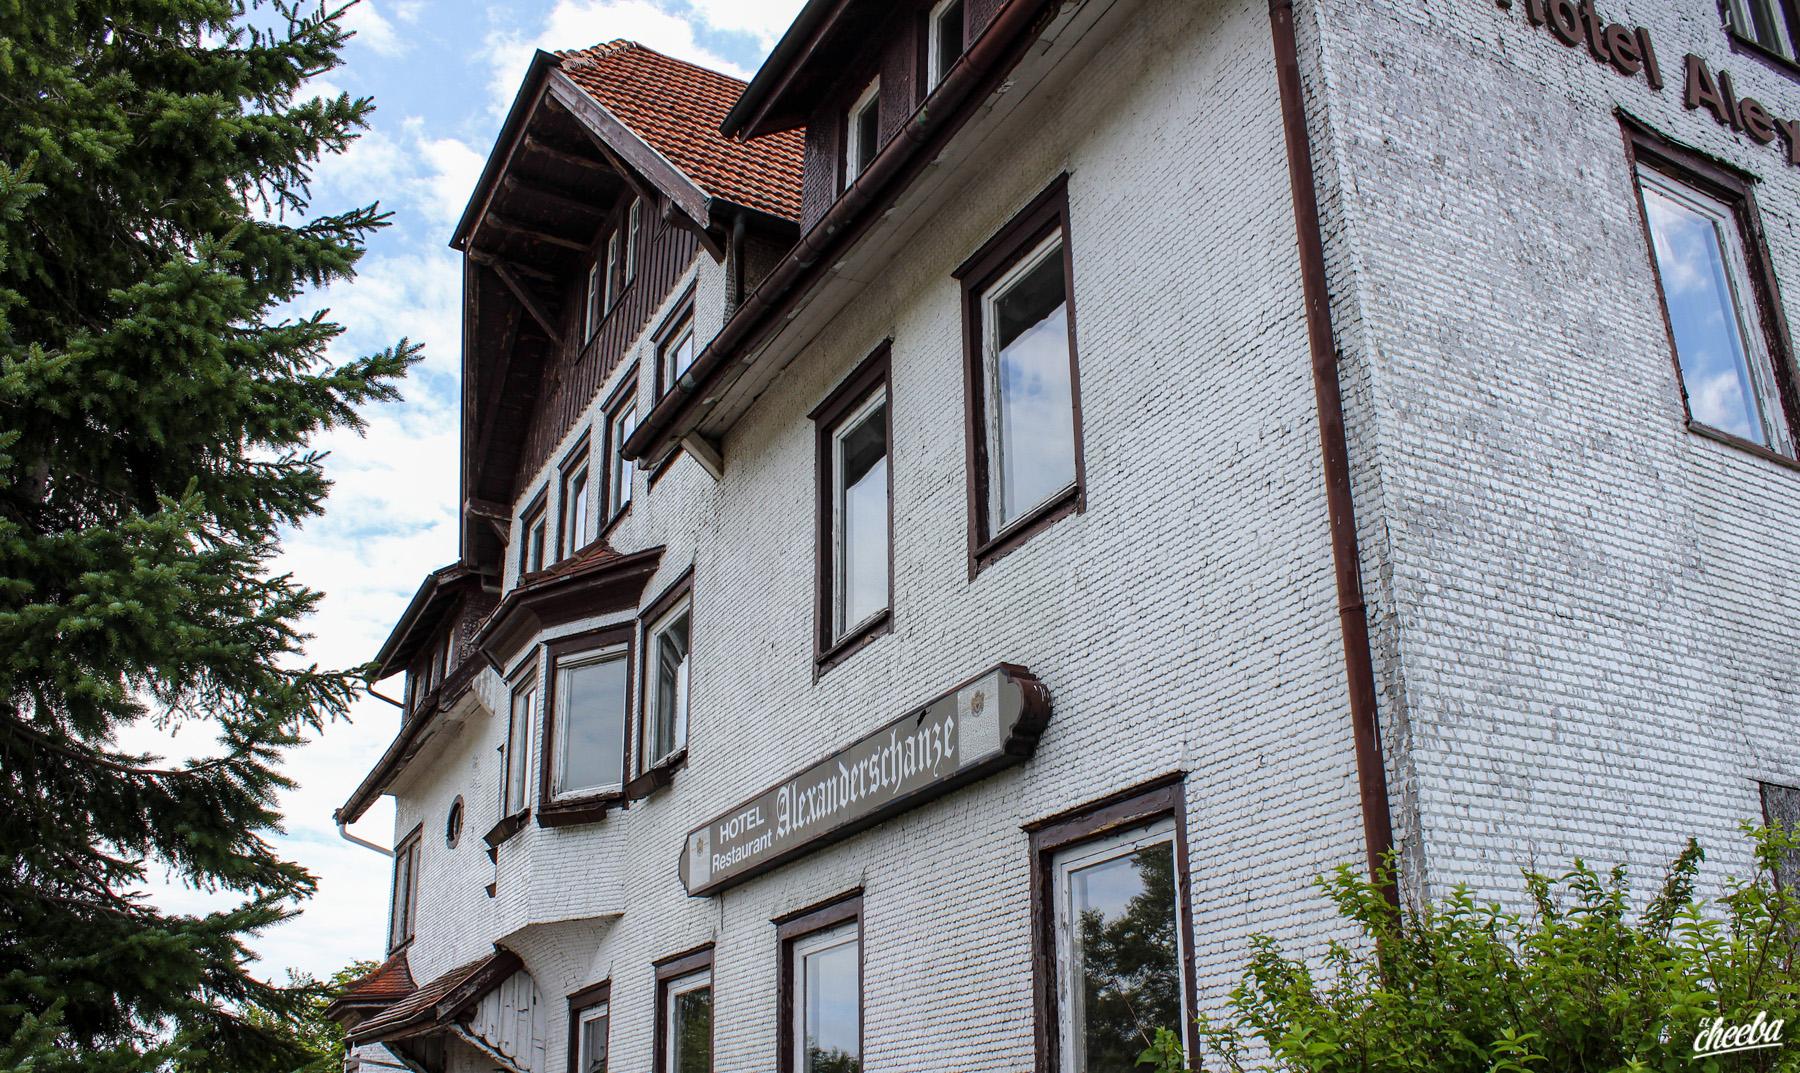 Urbex Hôtel abandonné Alexanderschanze en Allemagne - Urbex Allemagne by El Cheeba